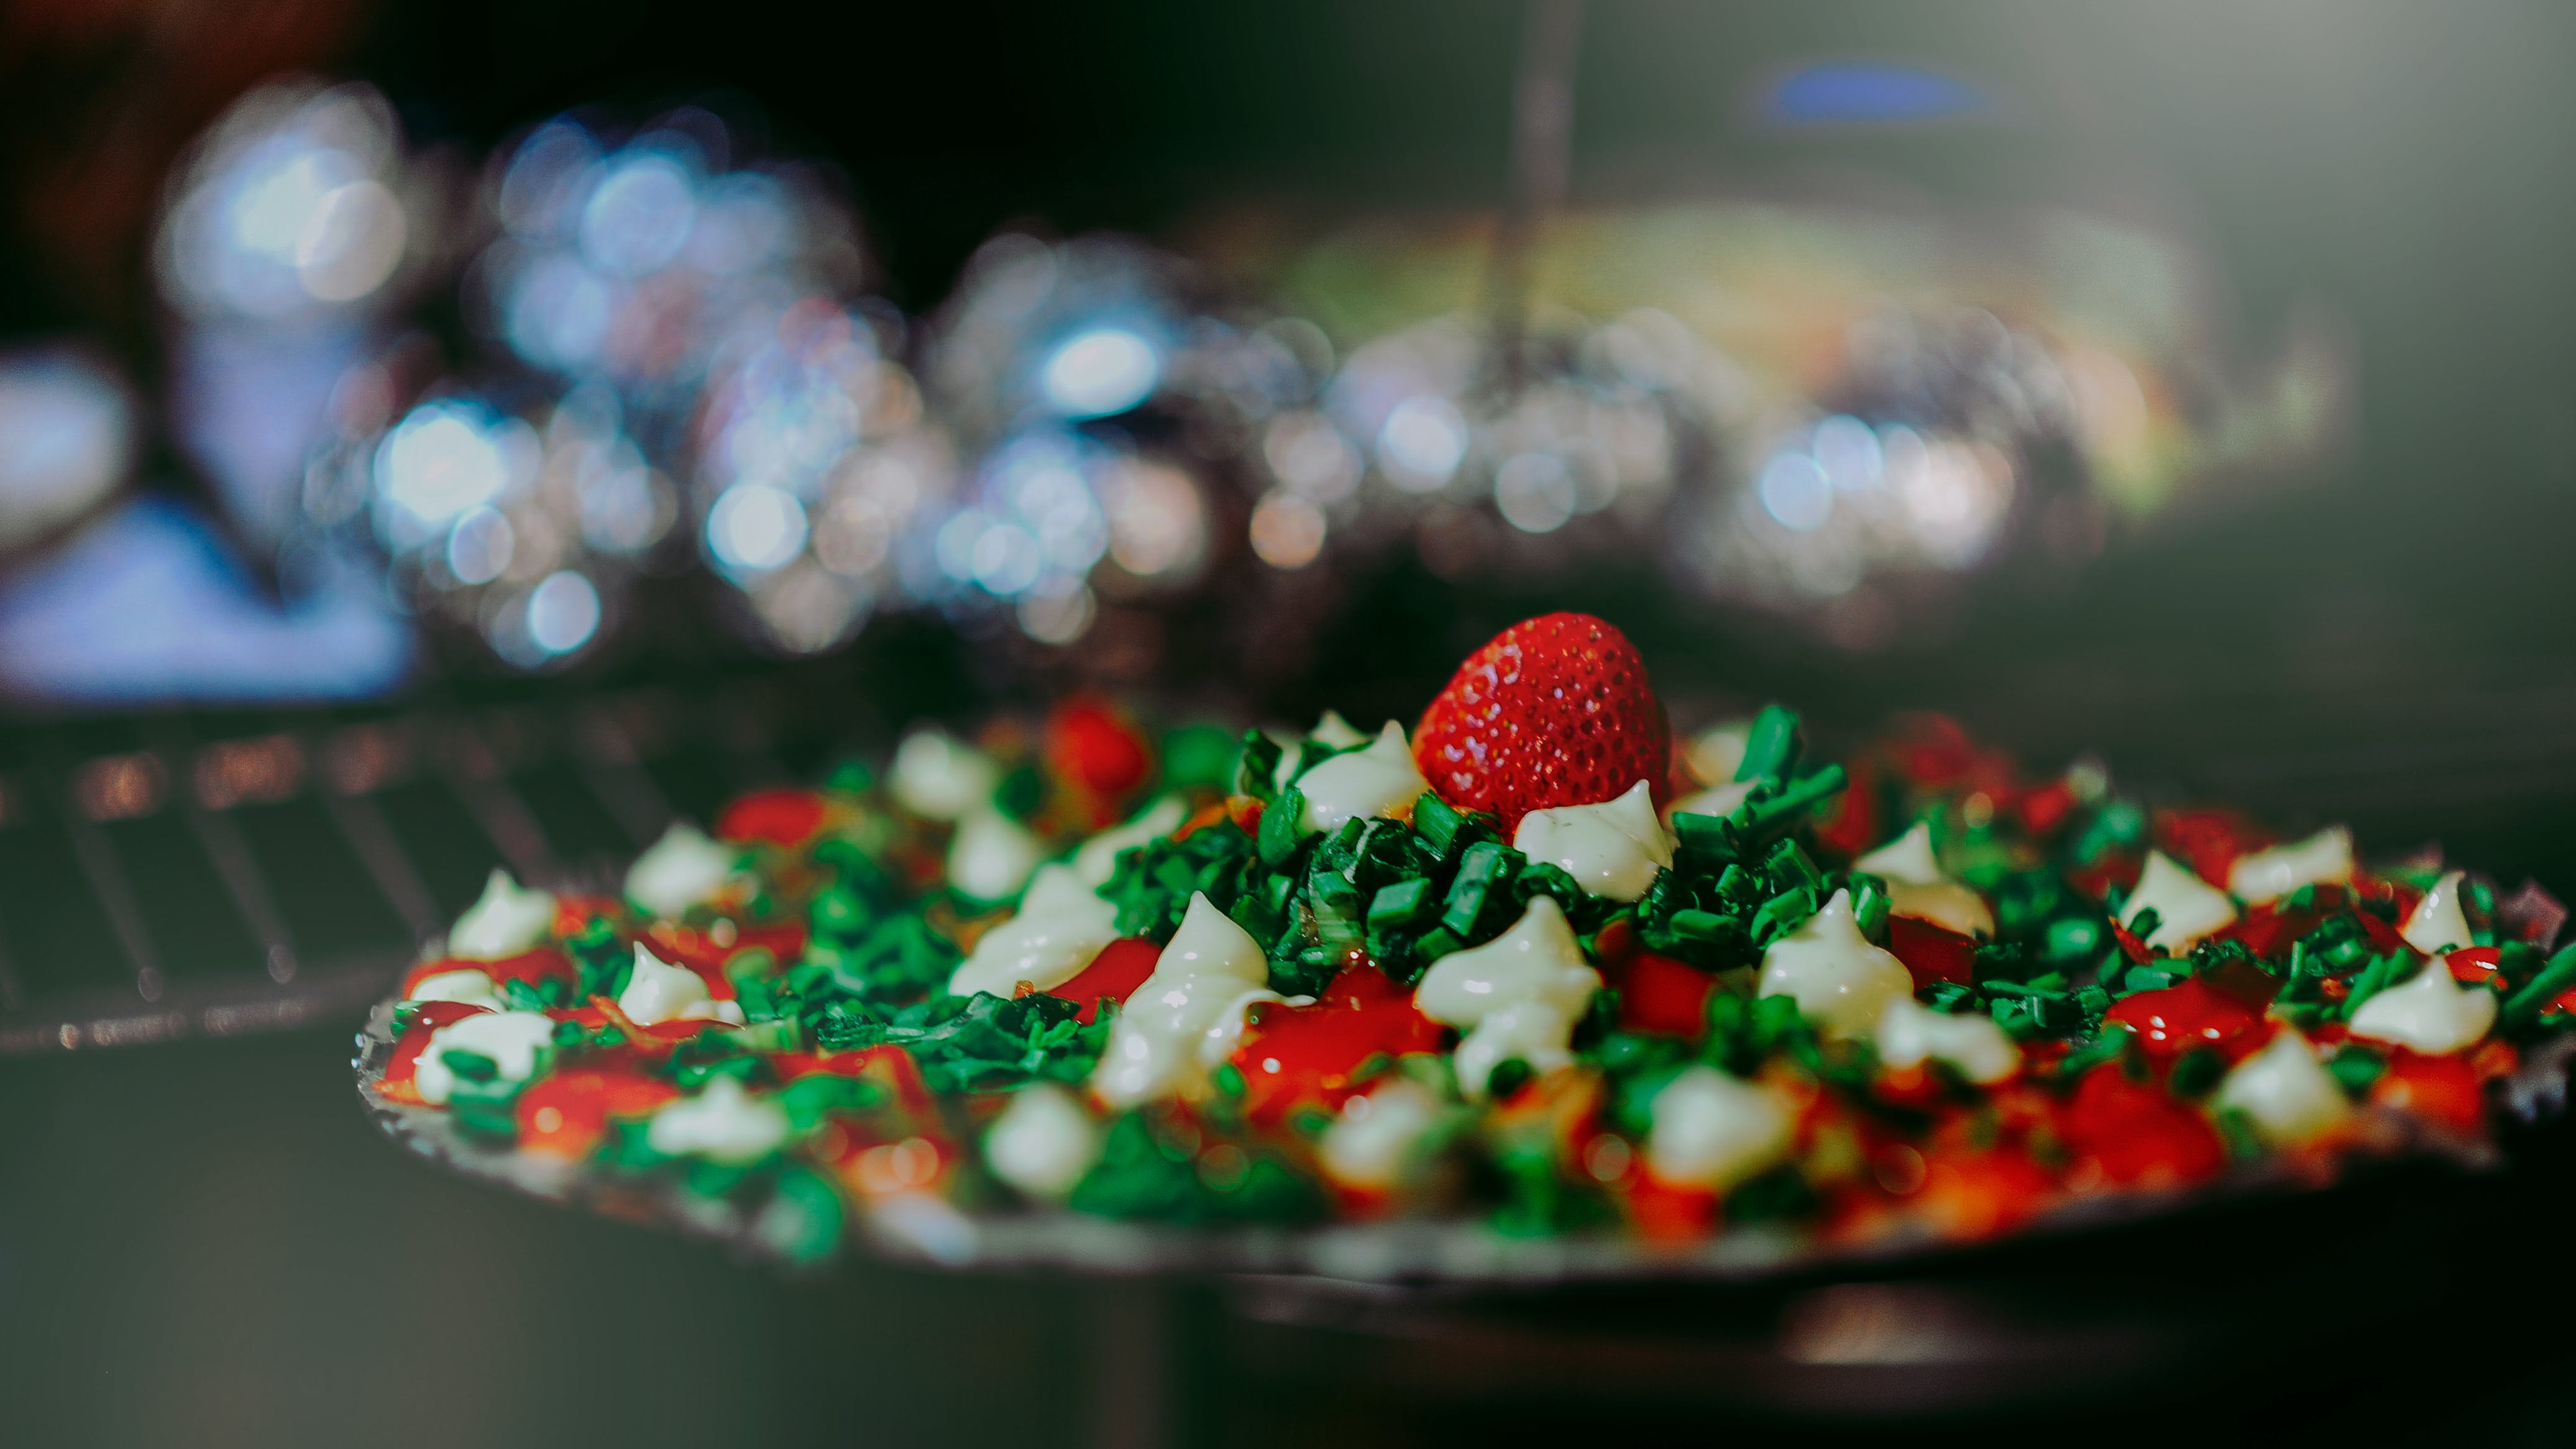 Close-up Photography of Salad